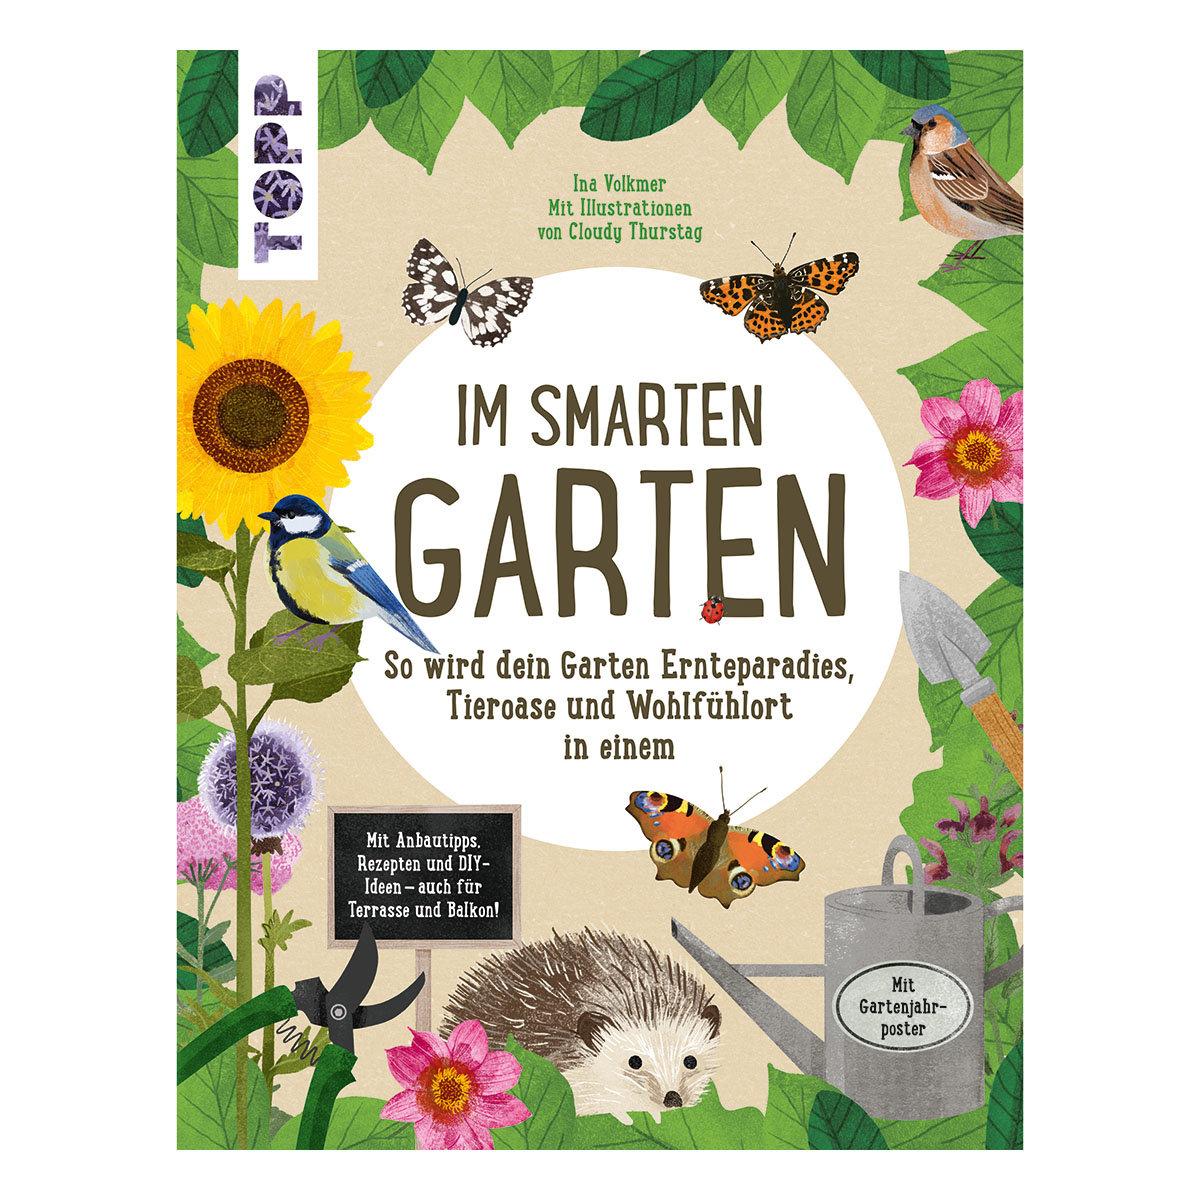 Im smarten Garten